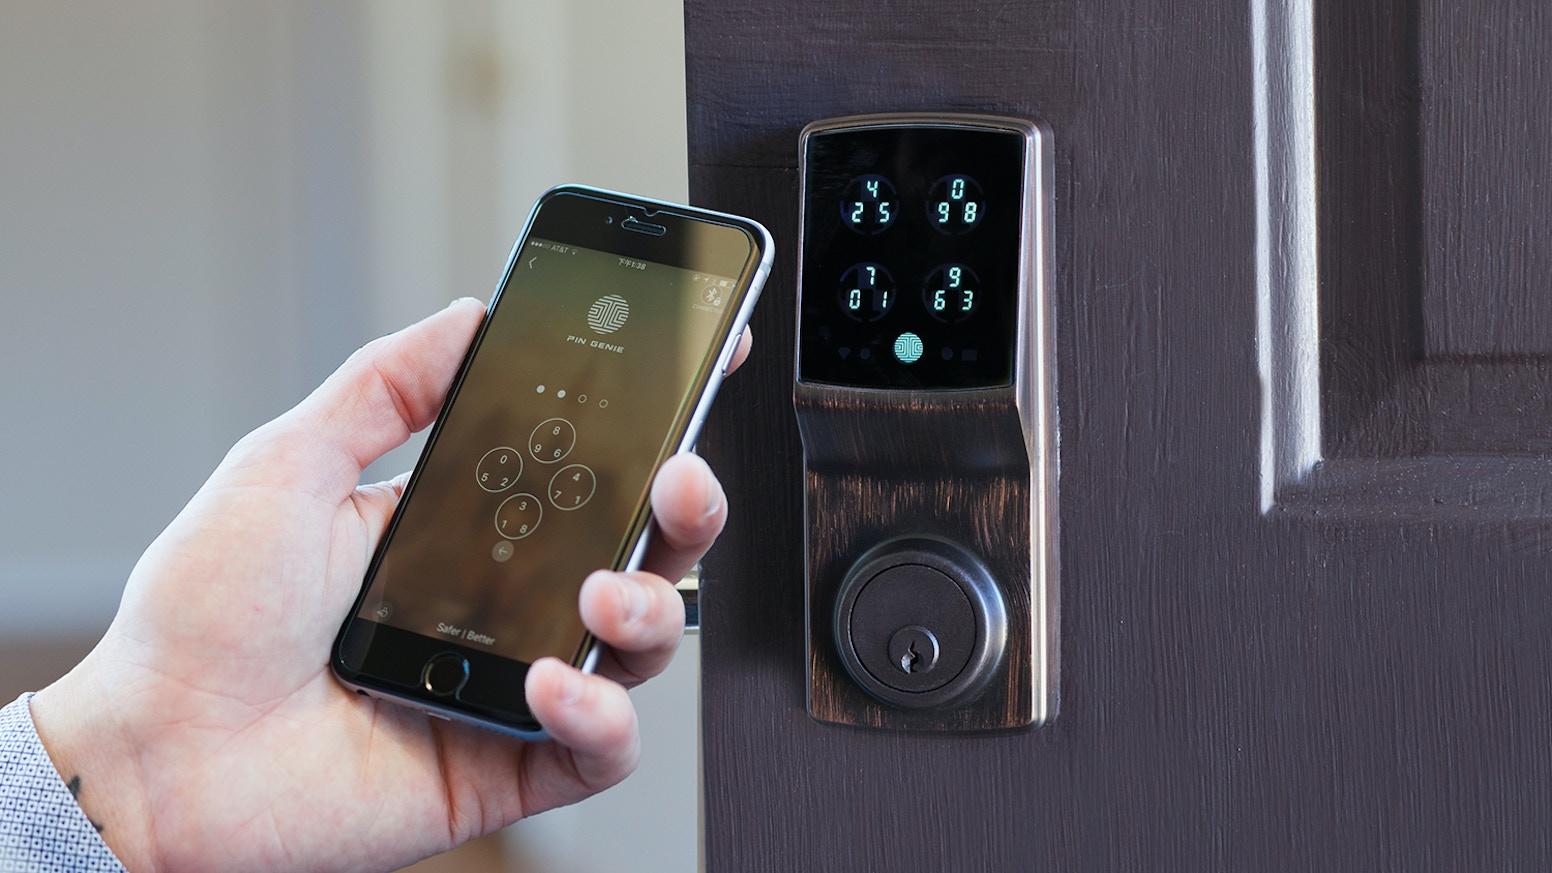 Hotel Dndamp Doorlock System Prototype Door Lock T Automatic With 805189c5189c52 Microcontroller Worlds First Peep Proof And Hidden Camera Smart Reshuffles Your Pin Pad